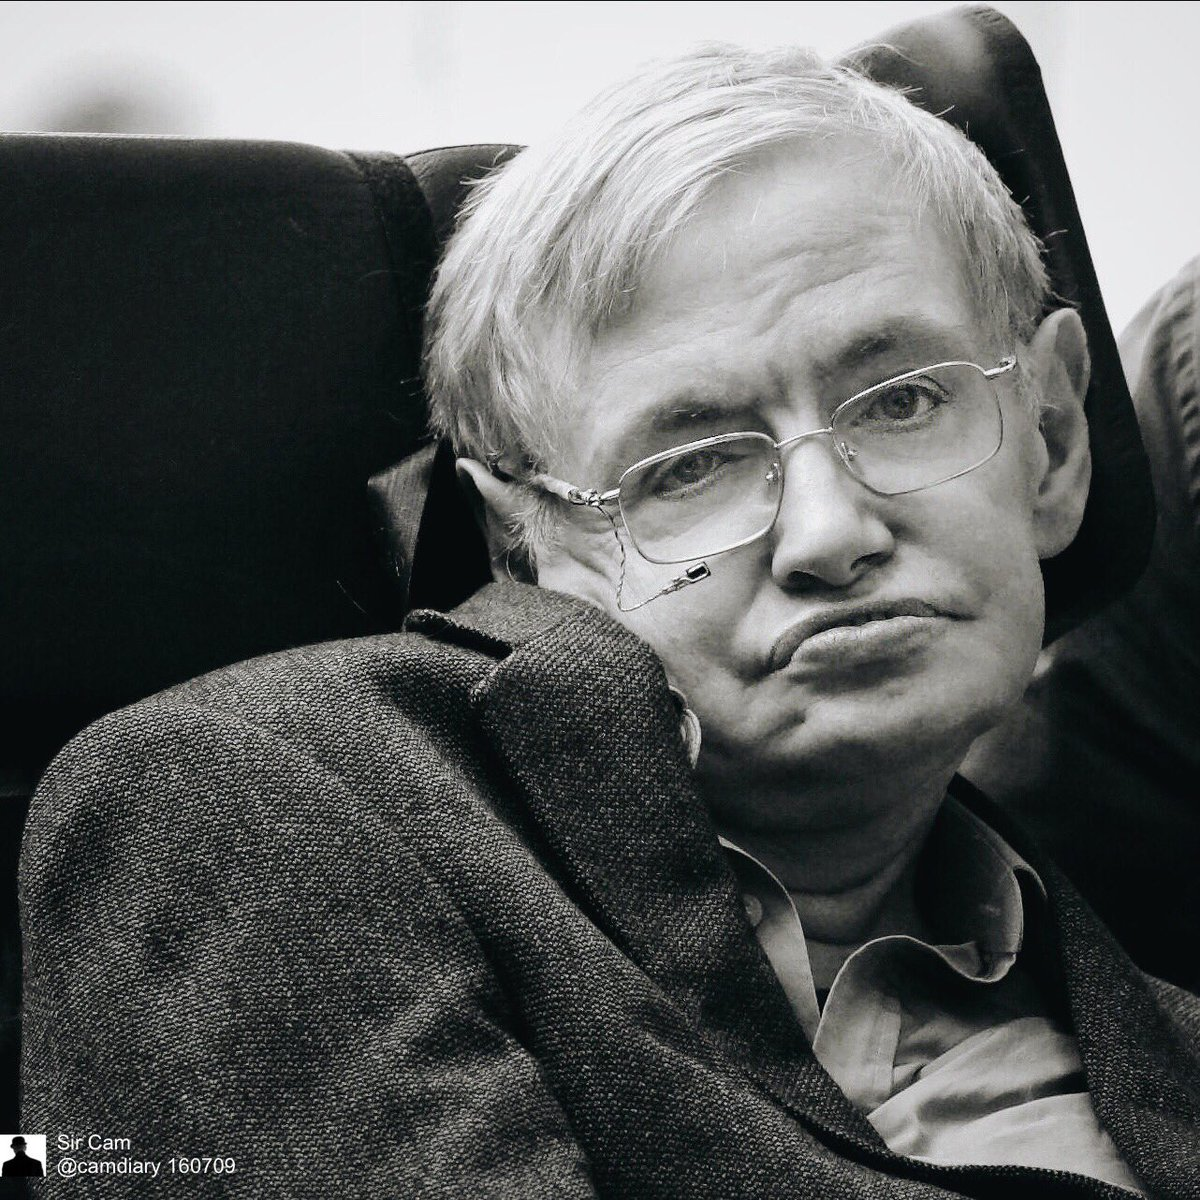 Happy 75th Birthday, Stephen Hawking. #Cambridge https://t.co/V6SUH3v1sW